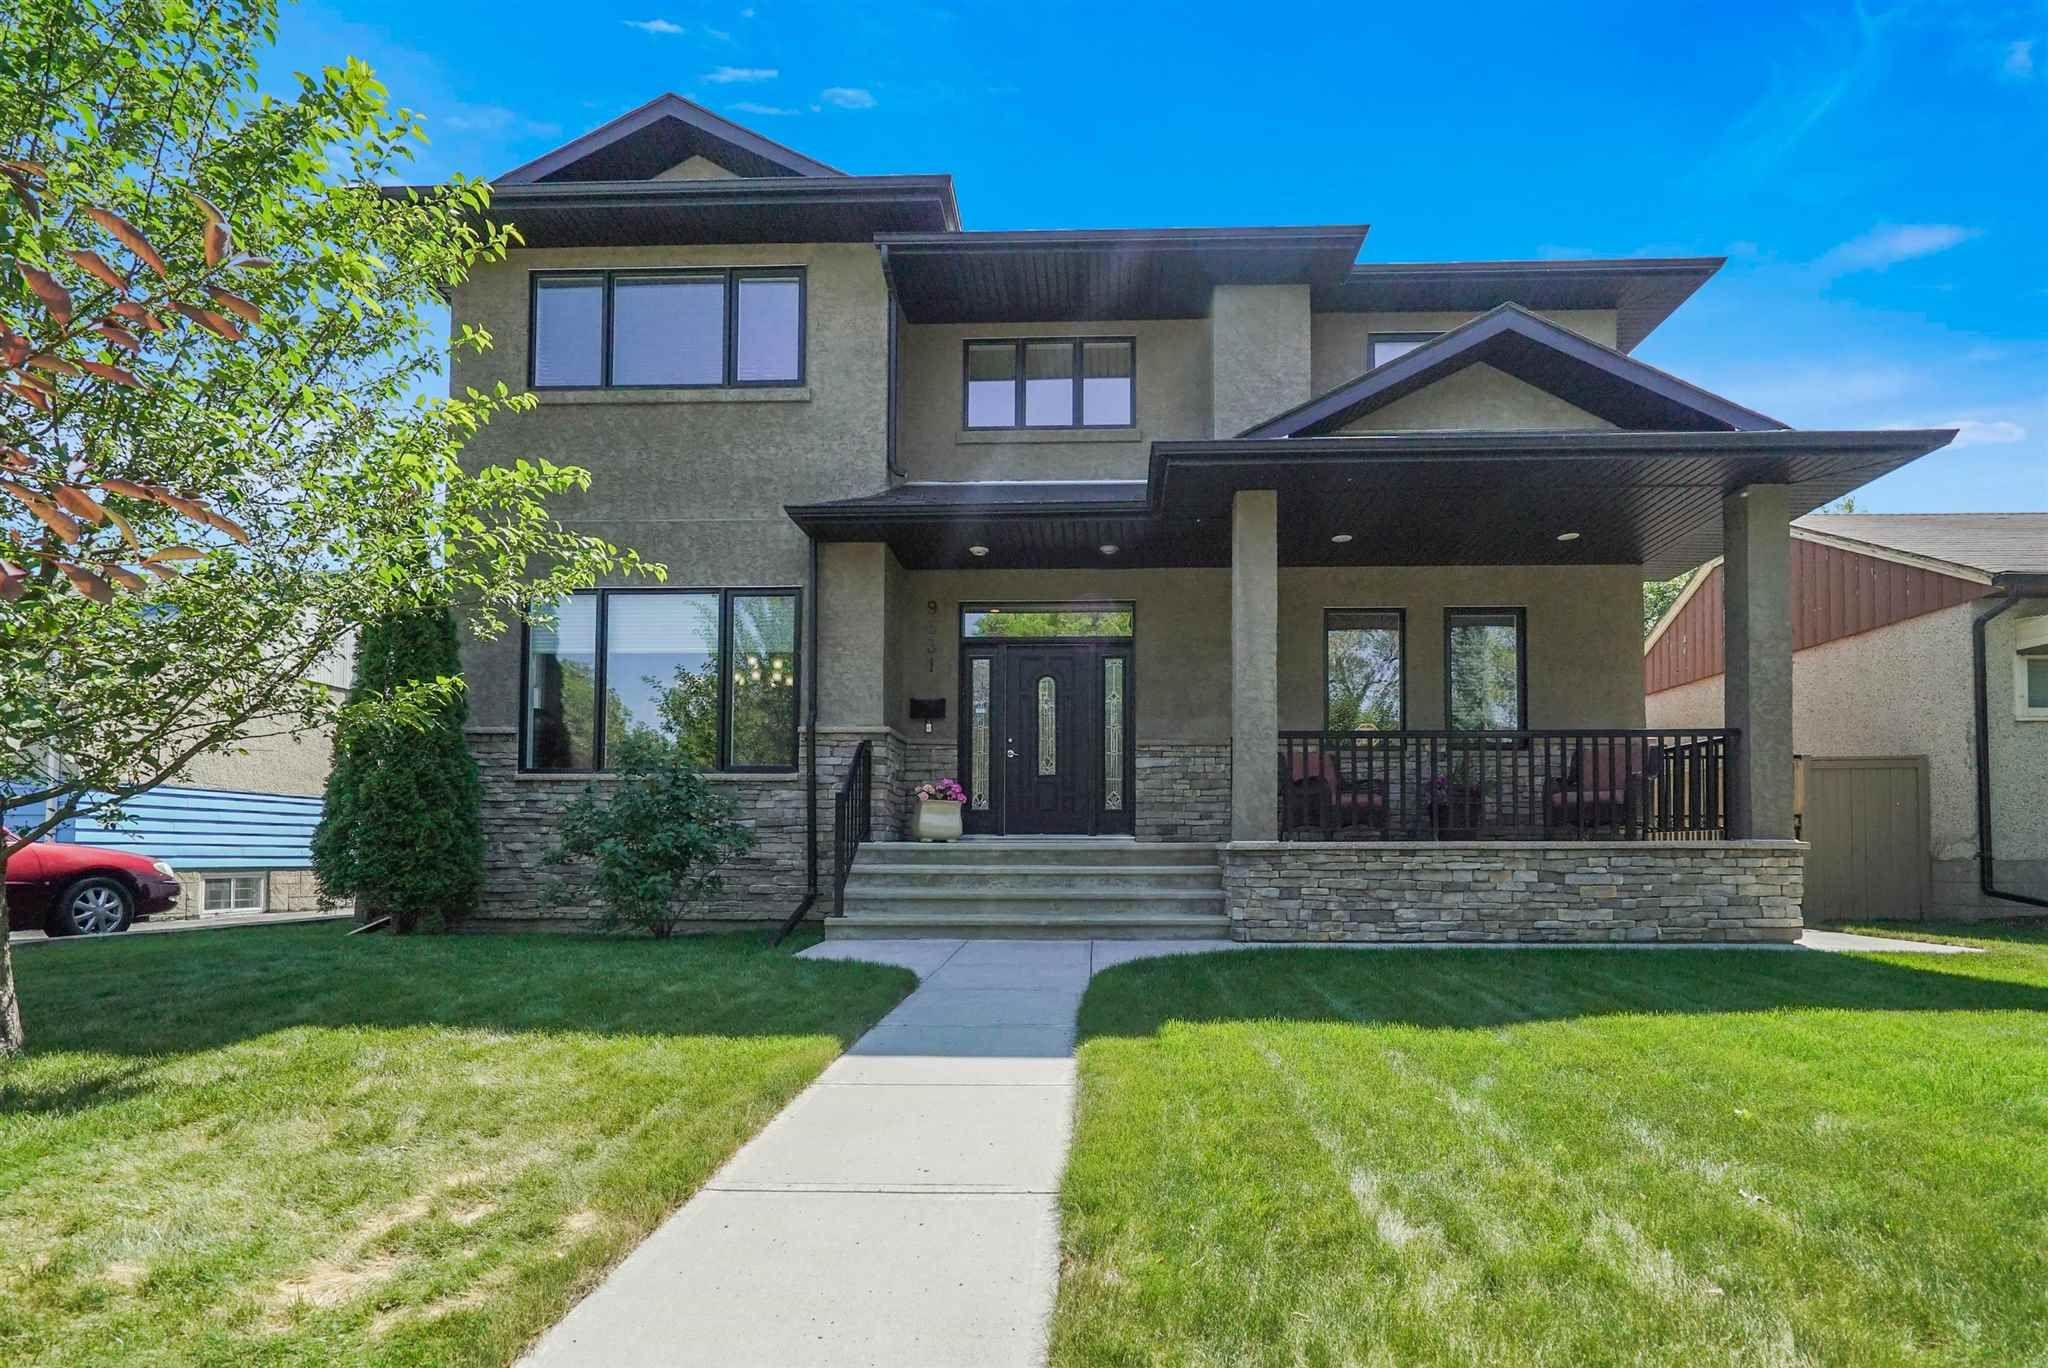 Main Photo: 9631 87 Street in Edmonton: Zone 18 House for sale : MLS®# E4254514